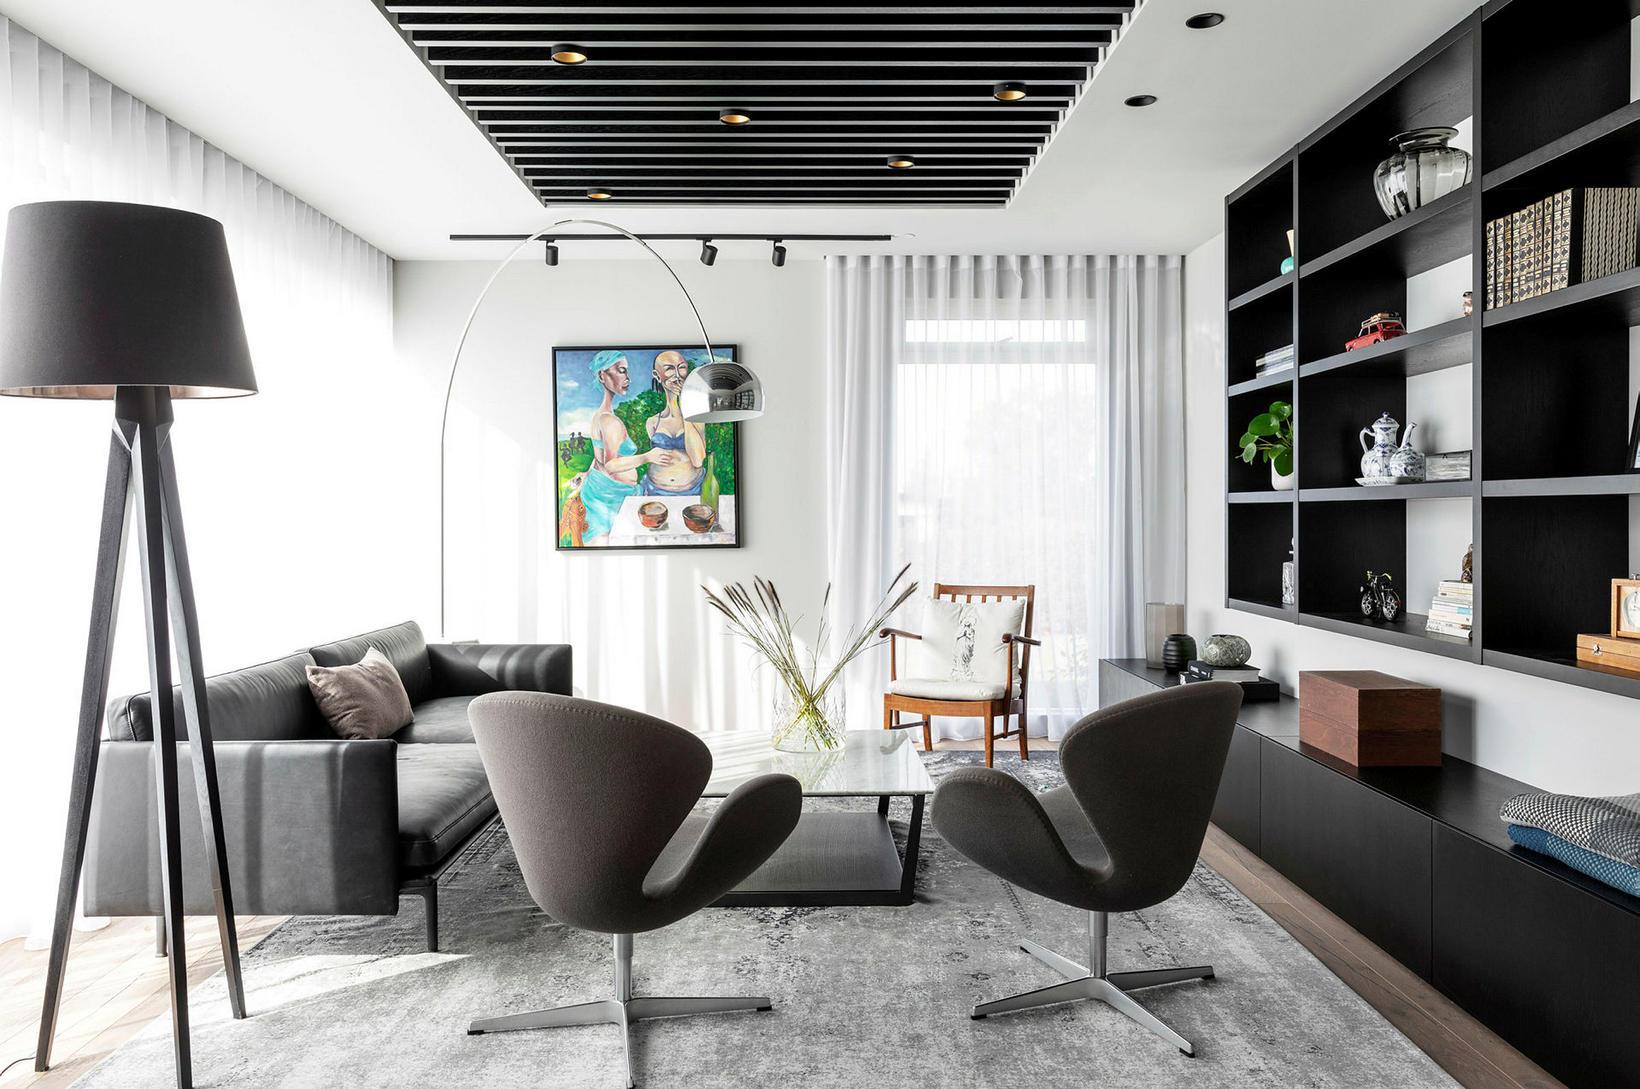 The book shelves are designed by Berglind Berndsen.